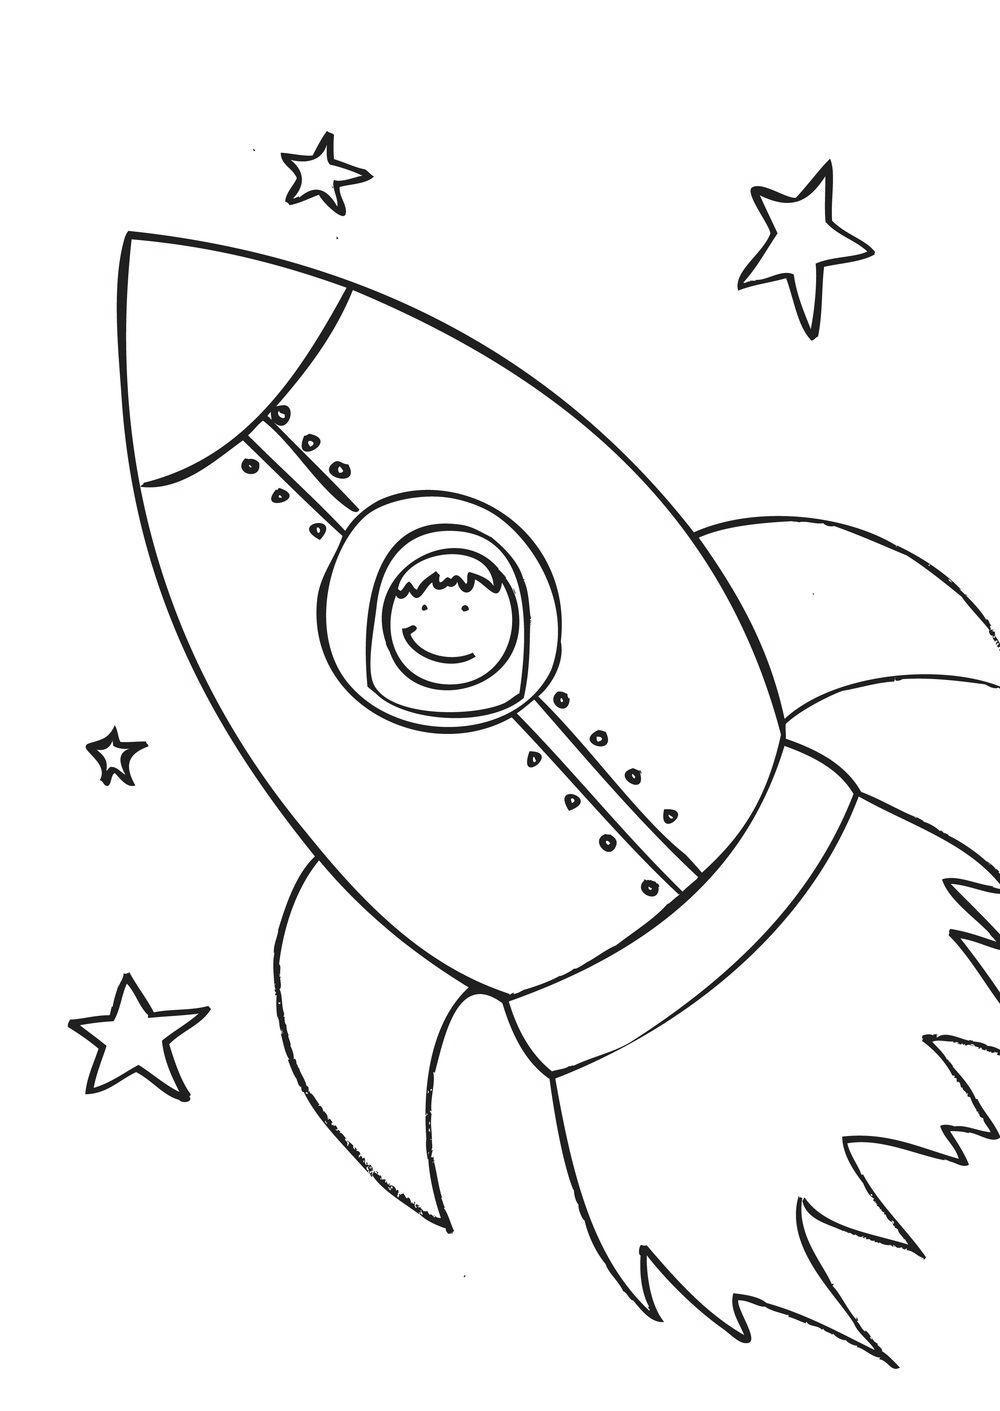 33 Rocket Ship Coloring Sheet - Free Printable Coloring Pages